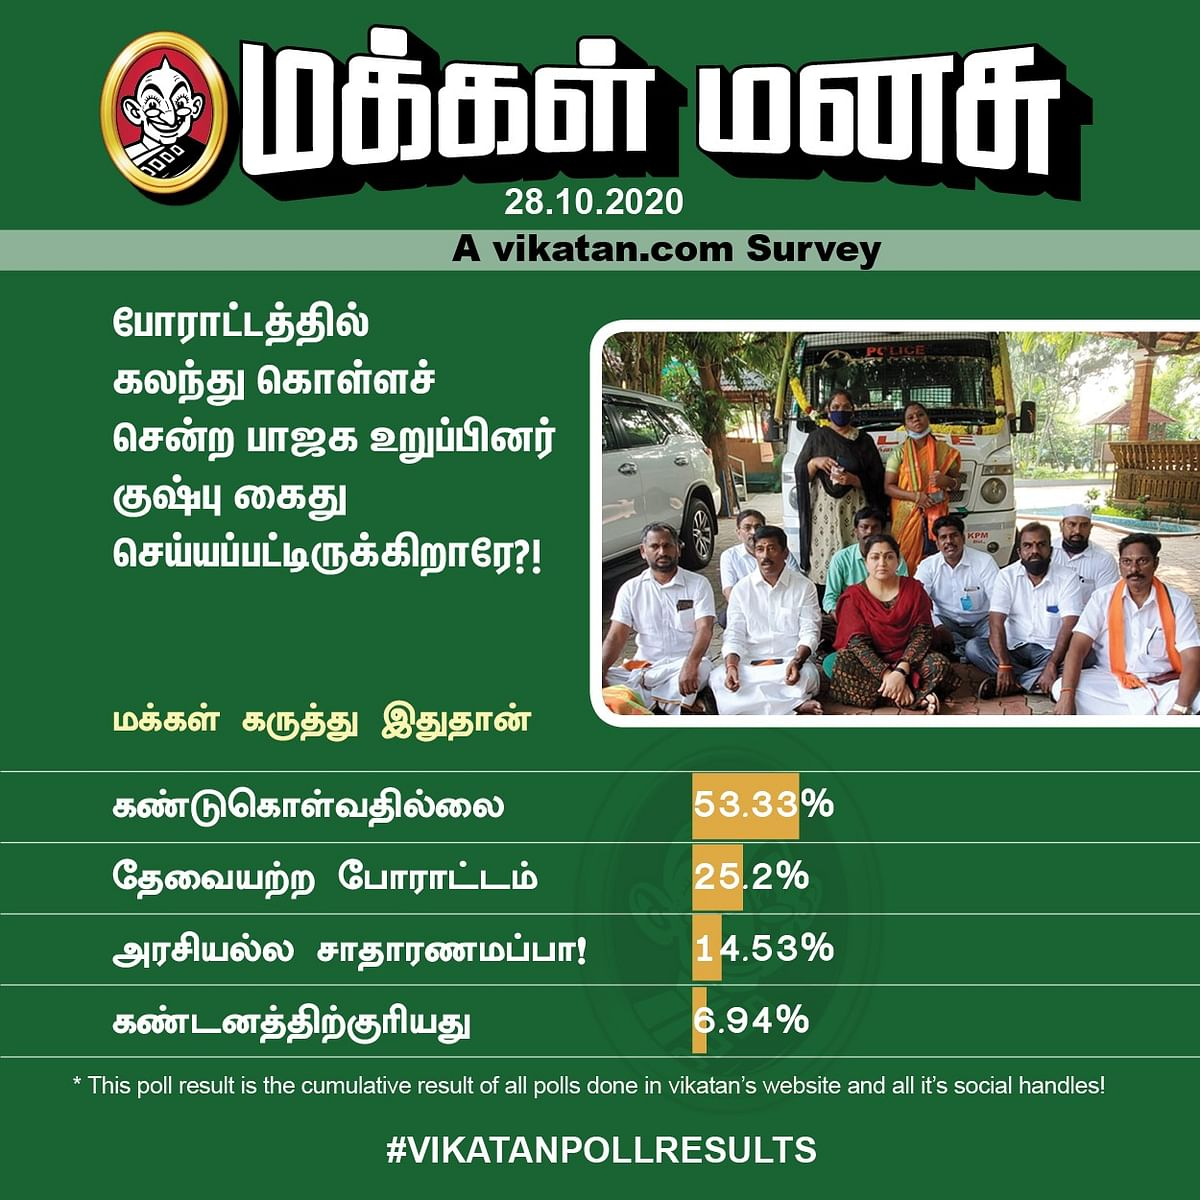 Khushboo | Vikatan Poll